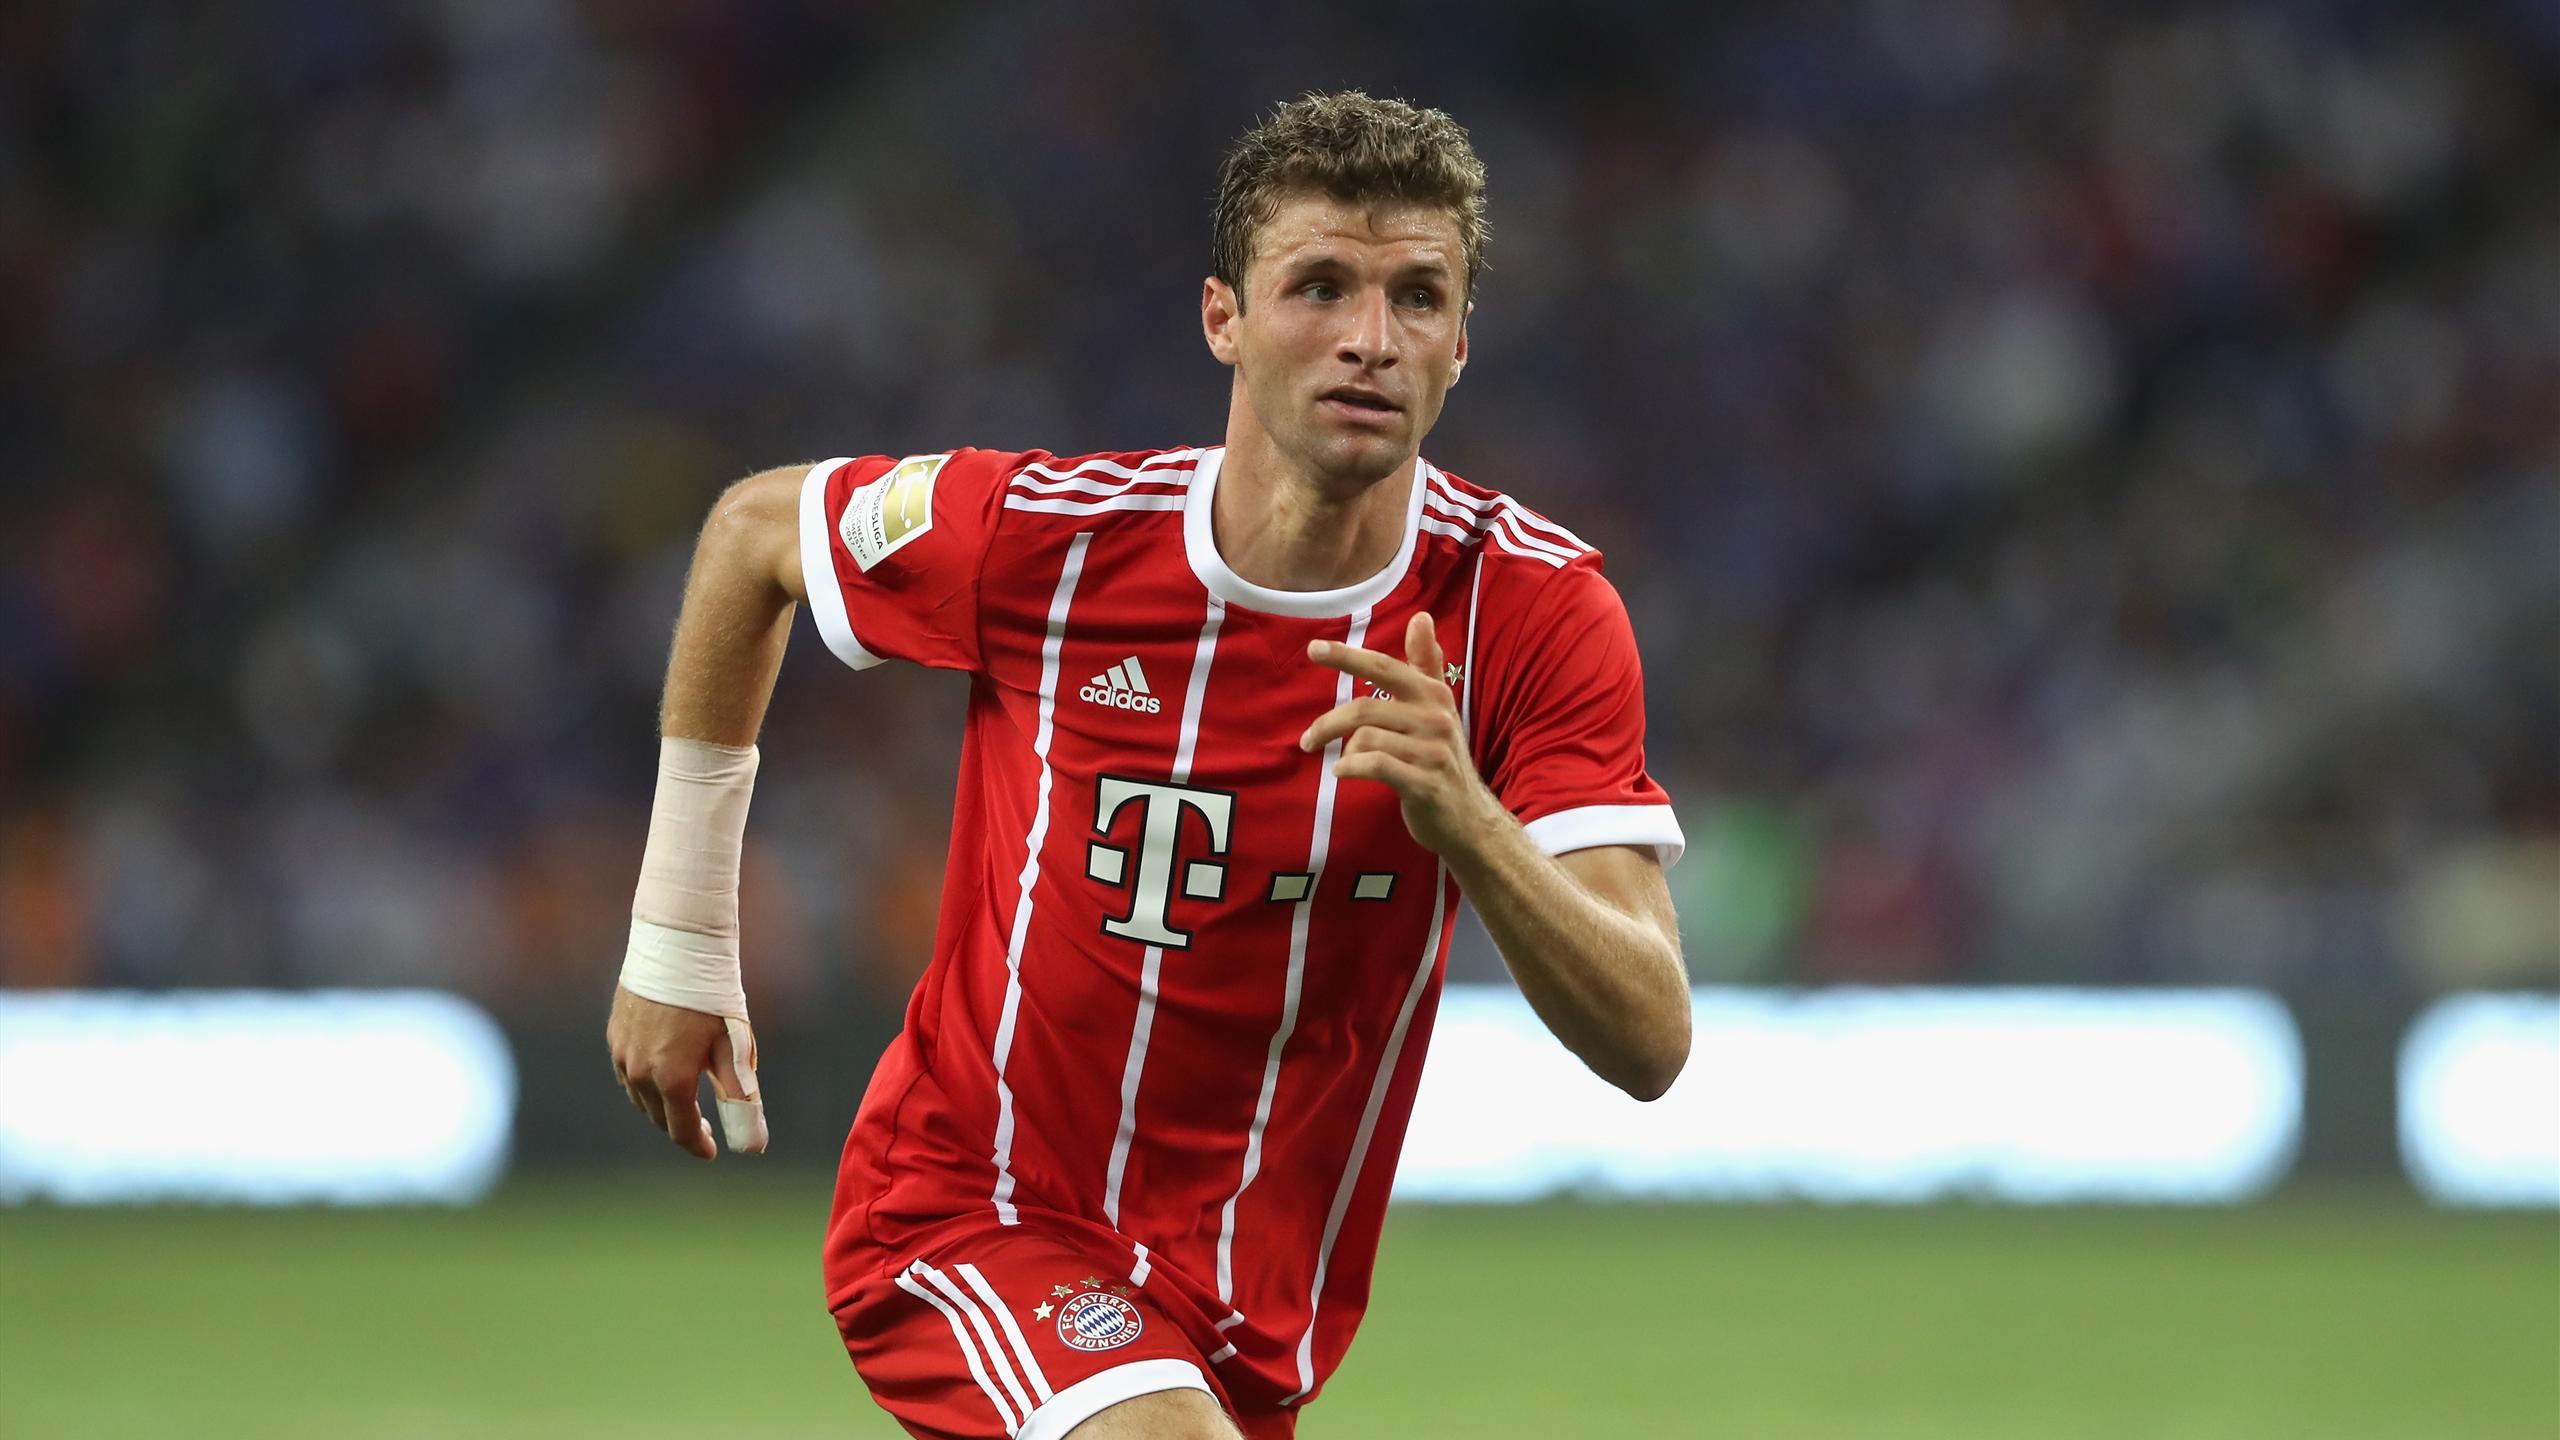 Thomas Müller Player Profile Football Eurosport